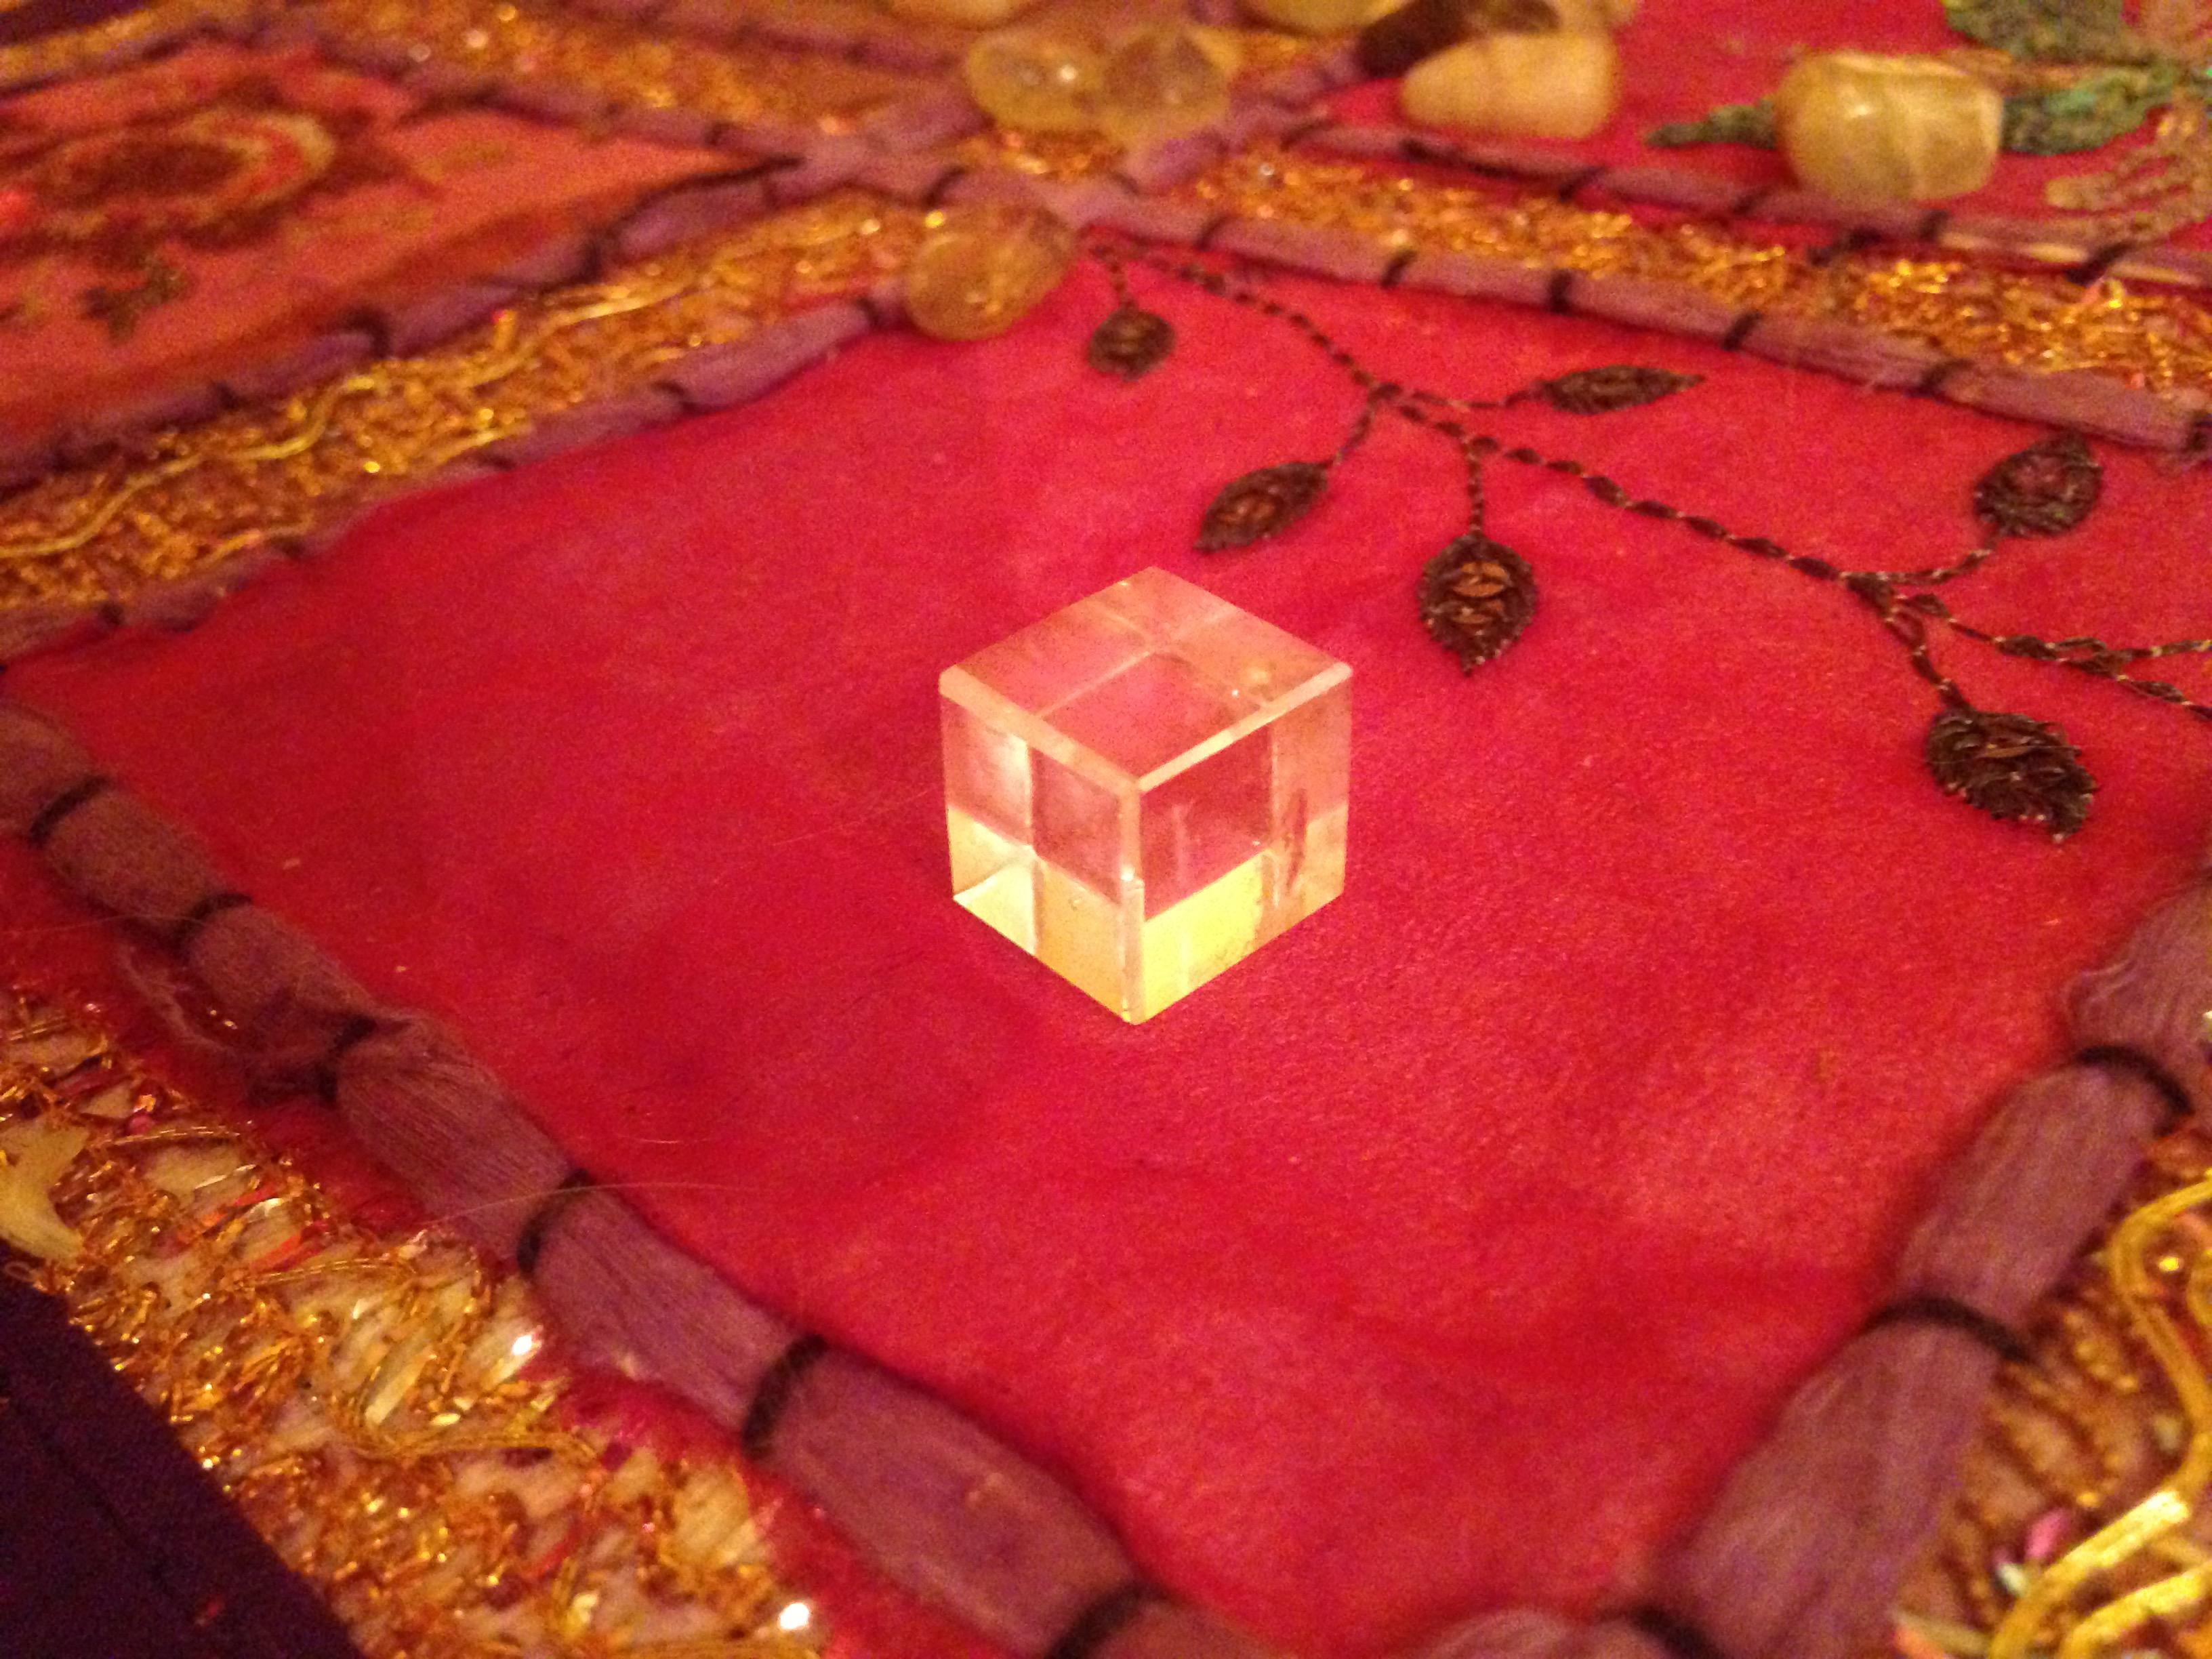 Cristal de roche : cube